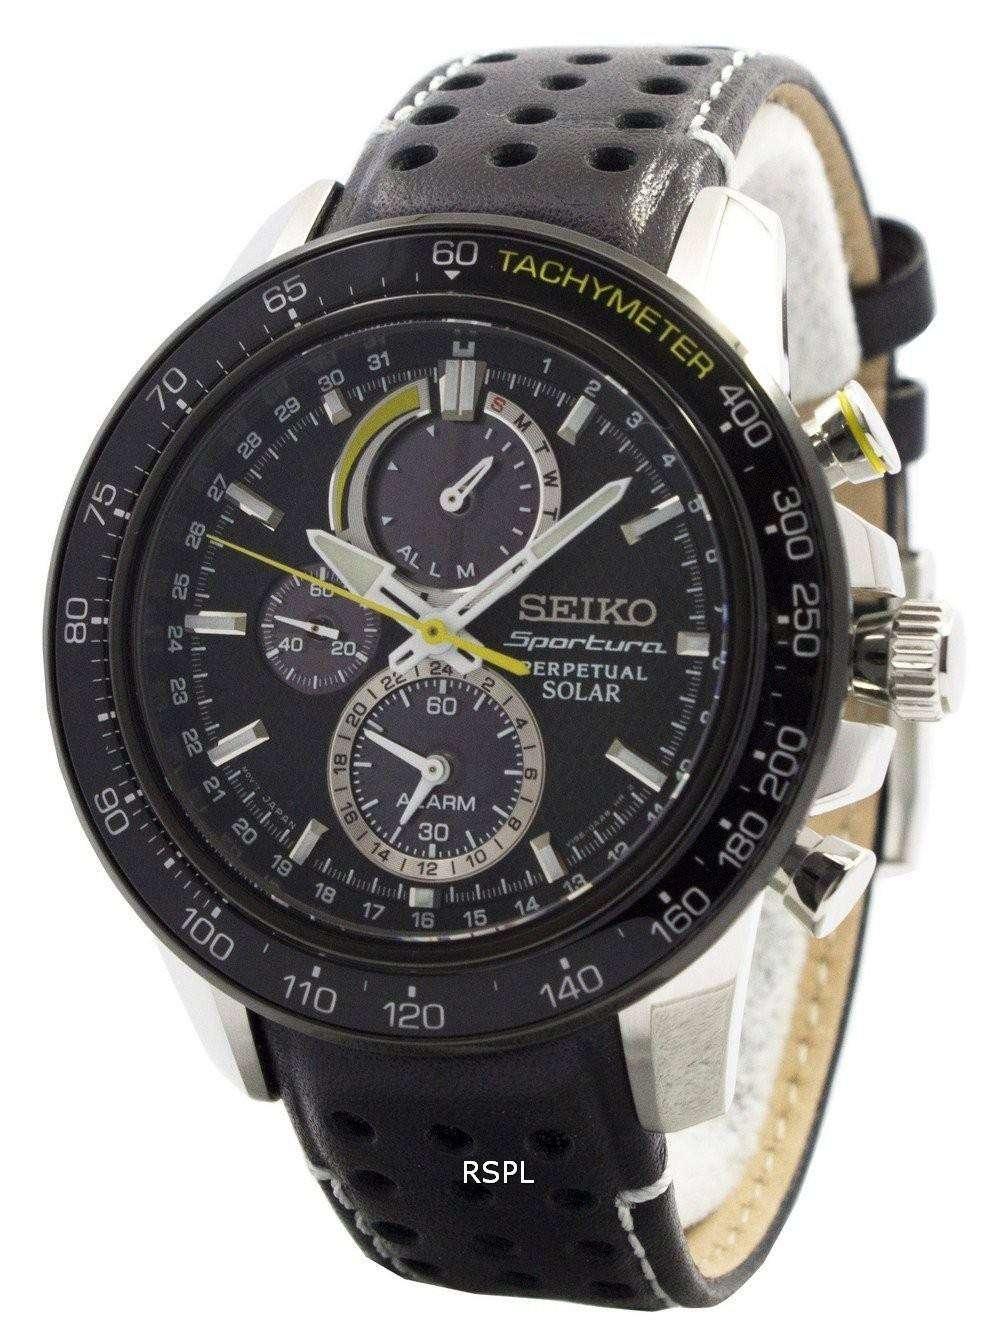 63edd544f Seiko Sportura Solar Chronograph Perpetual SSC361P1 SSC361P Mens Watch